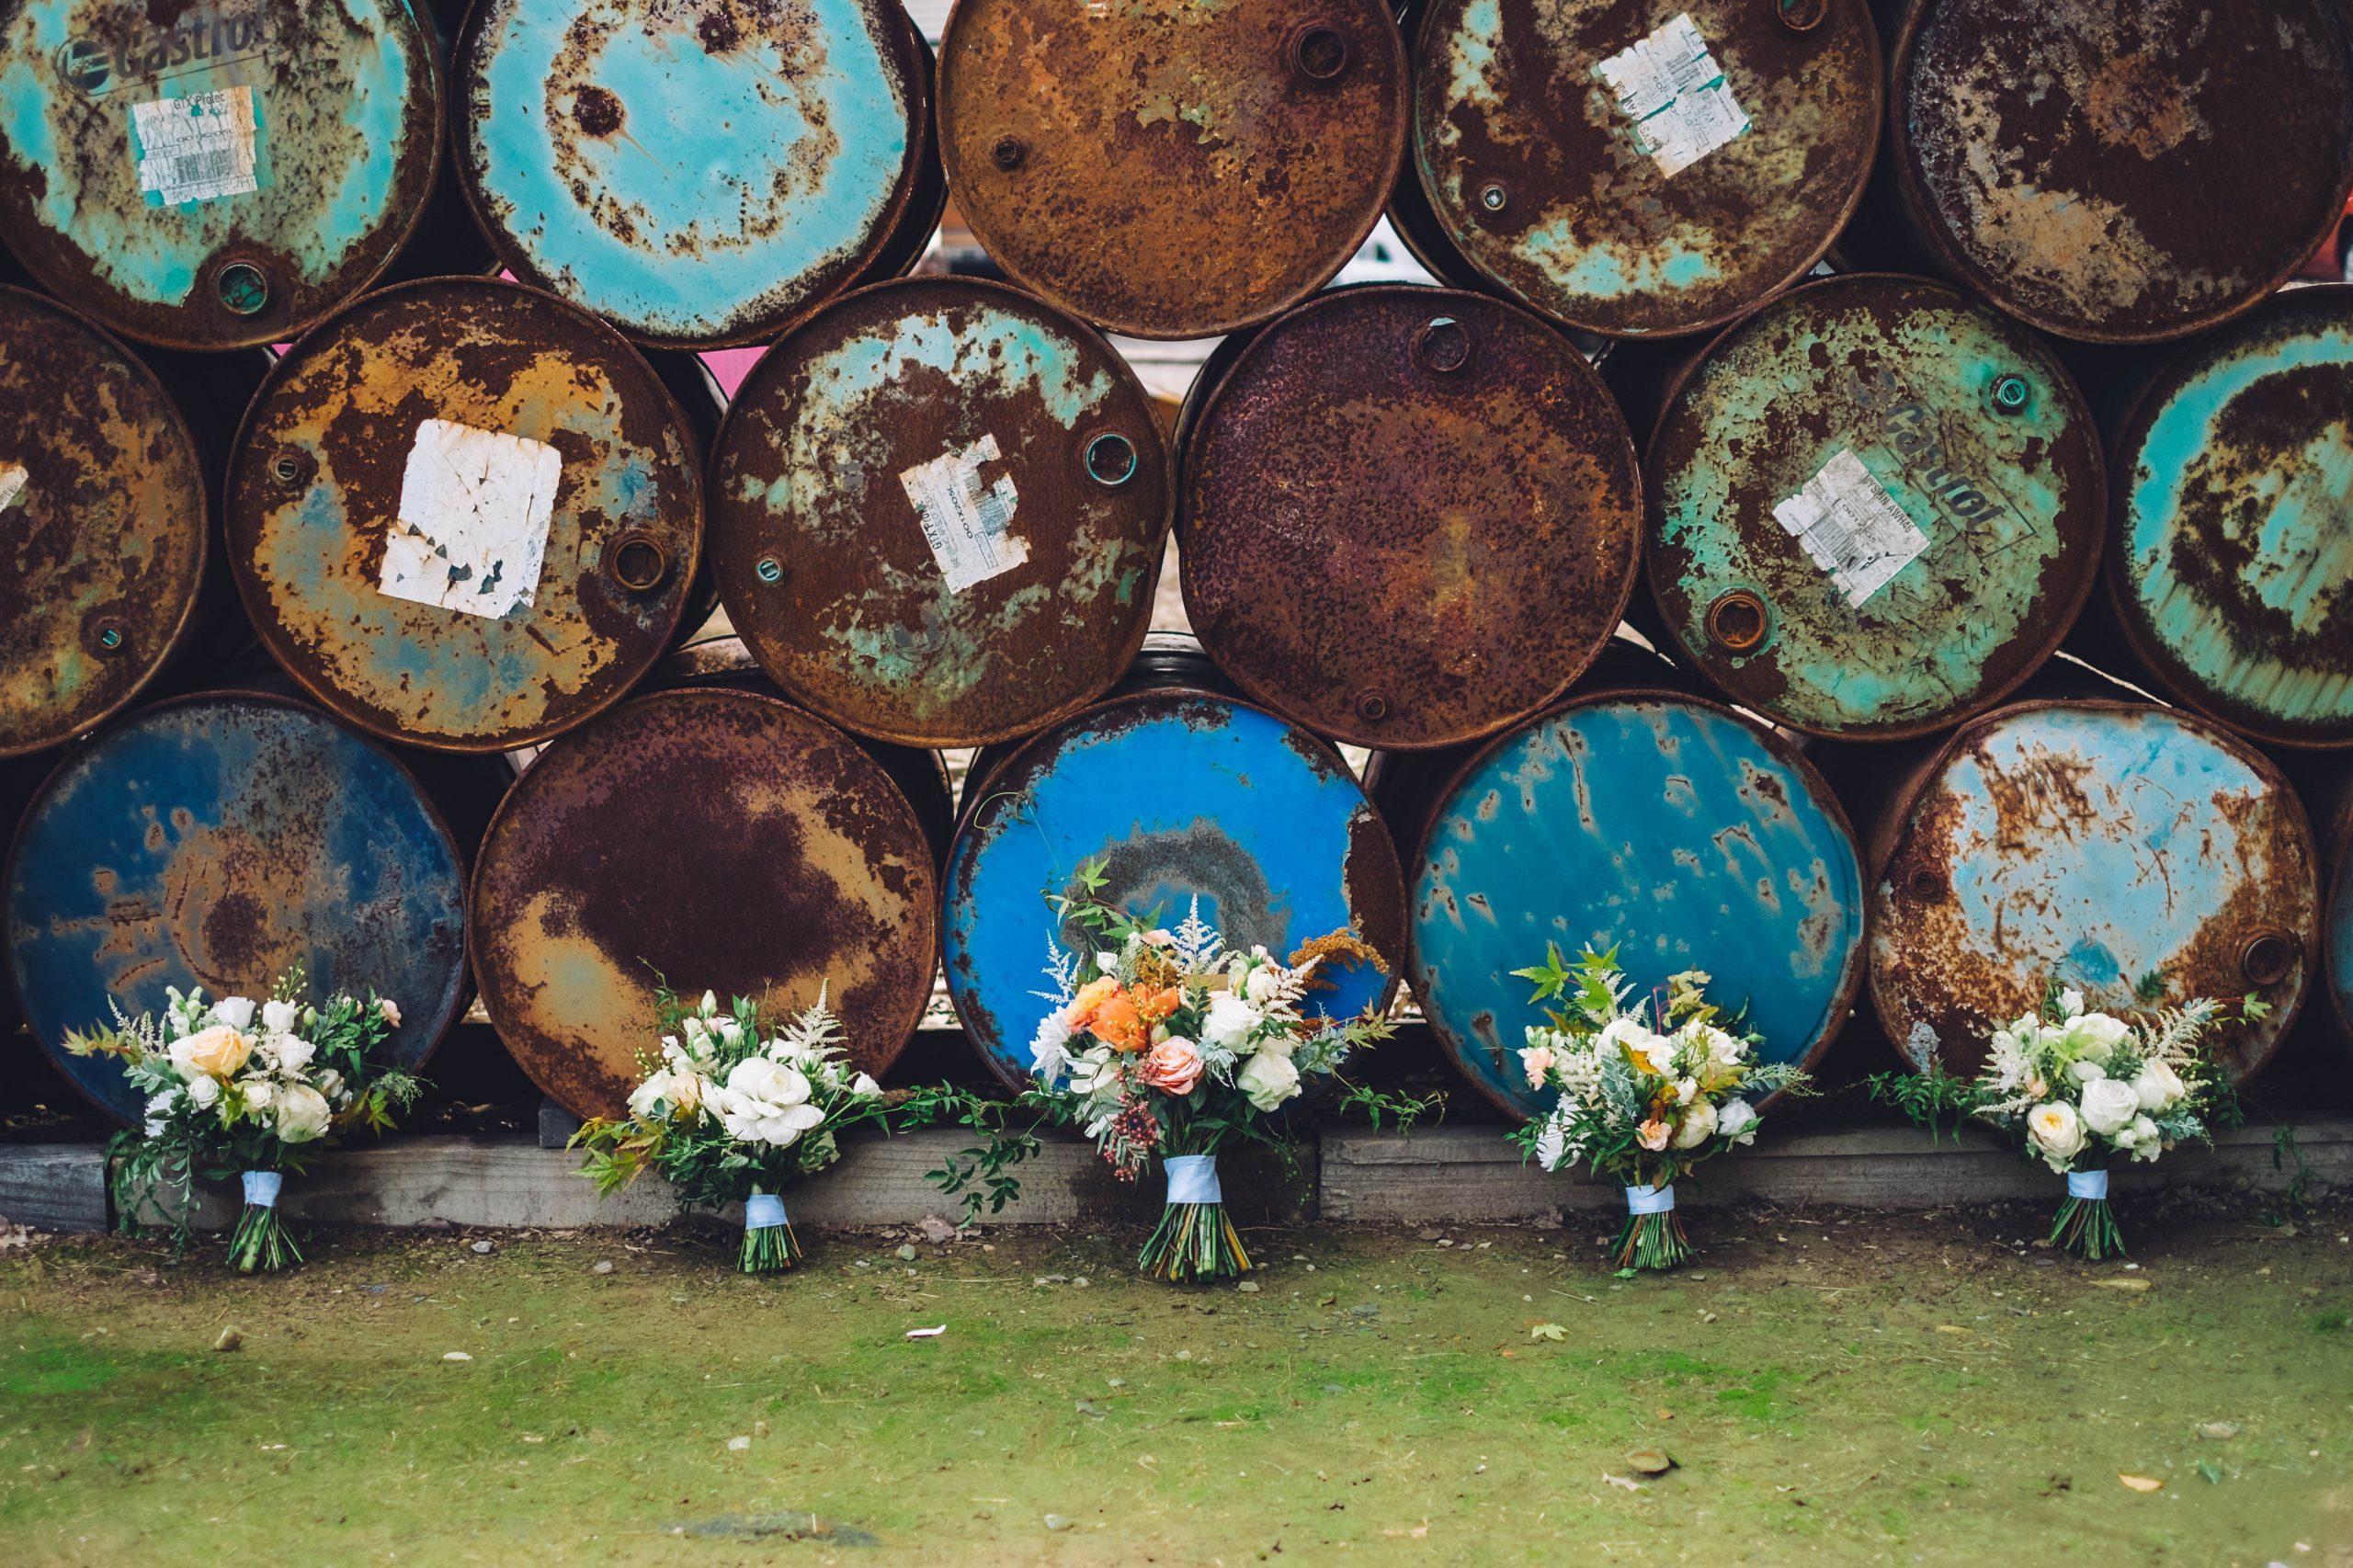 gold coast wedding, tipi wedding, tipi hire, large marquee hire, gold coast, events, gold coast wedding